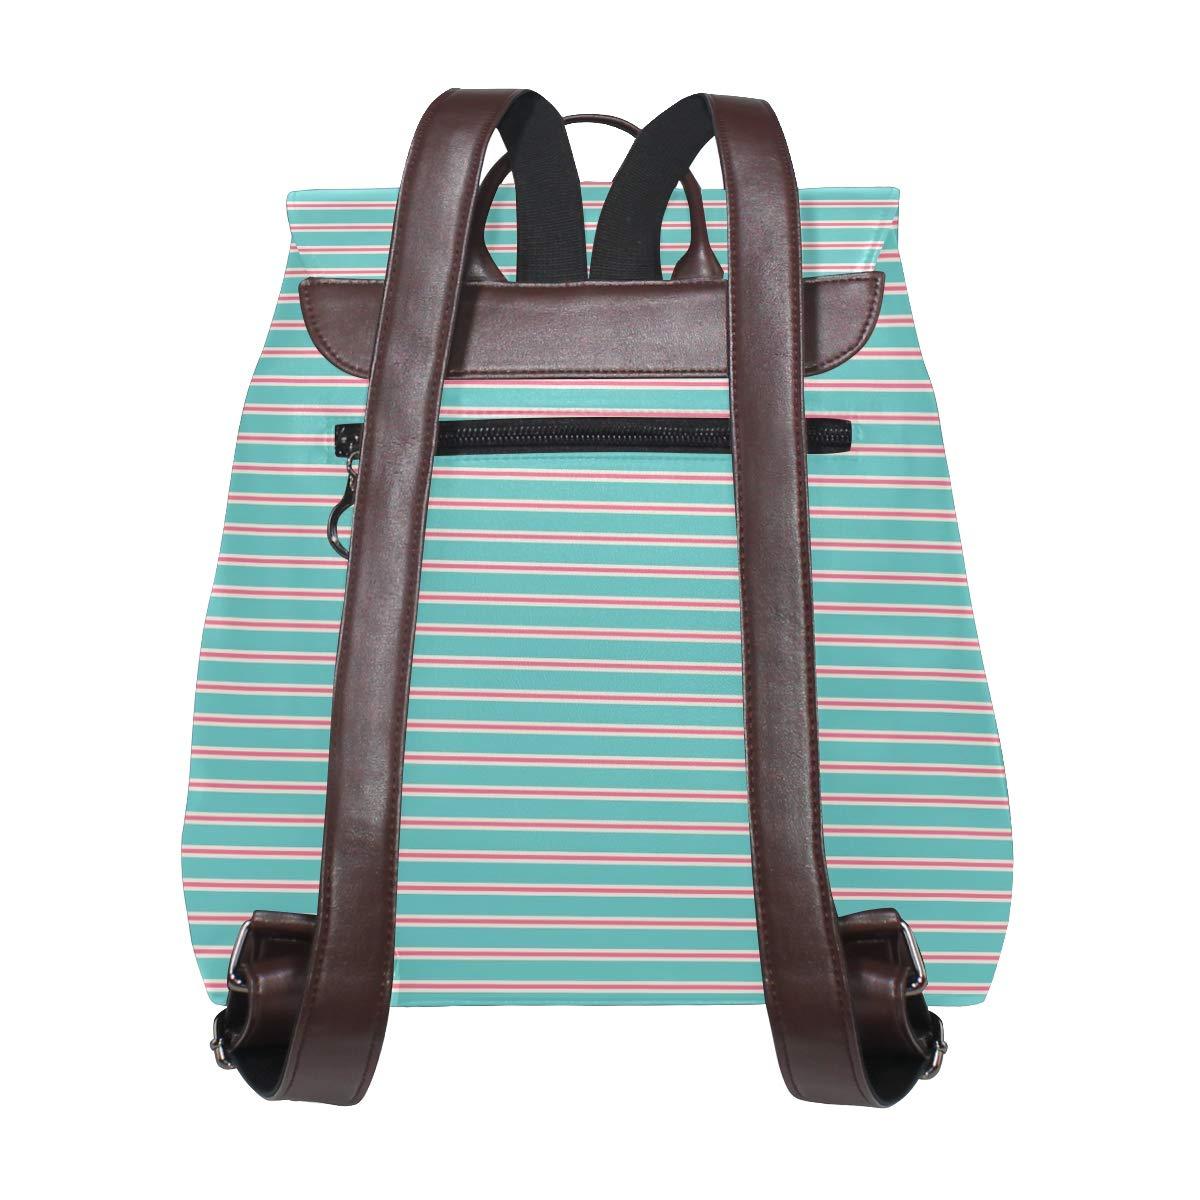 b4275bfbce ... DEZIRO Leather blu Line School Pack Pack Pack zaino borsa da viaggio  f5e295 ...